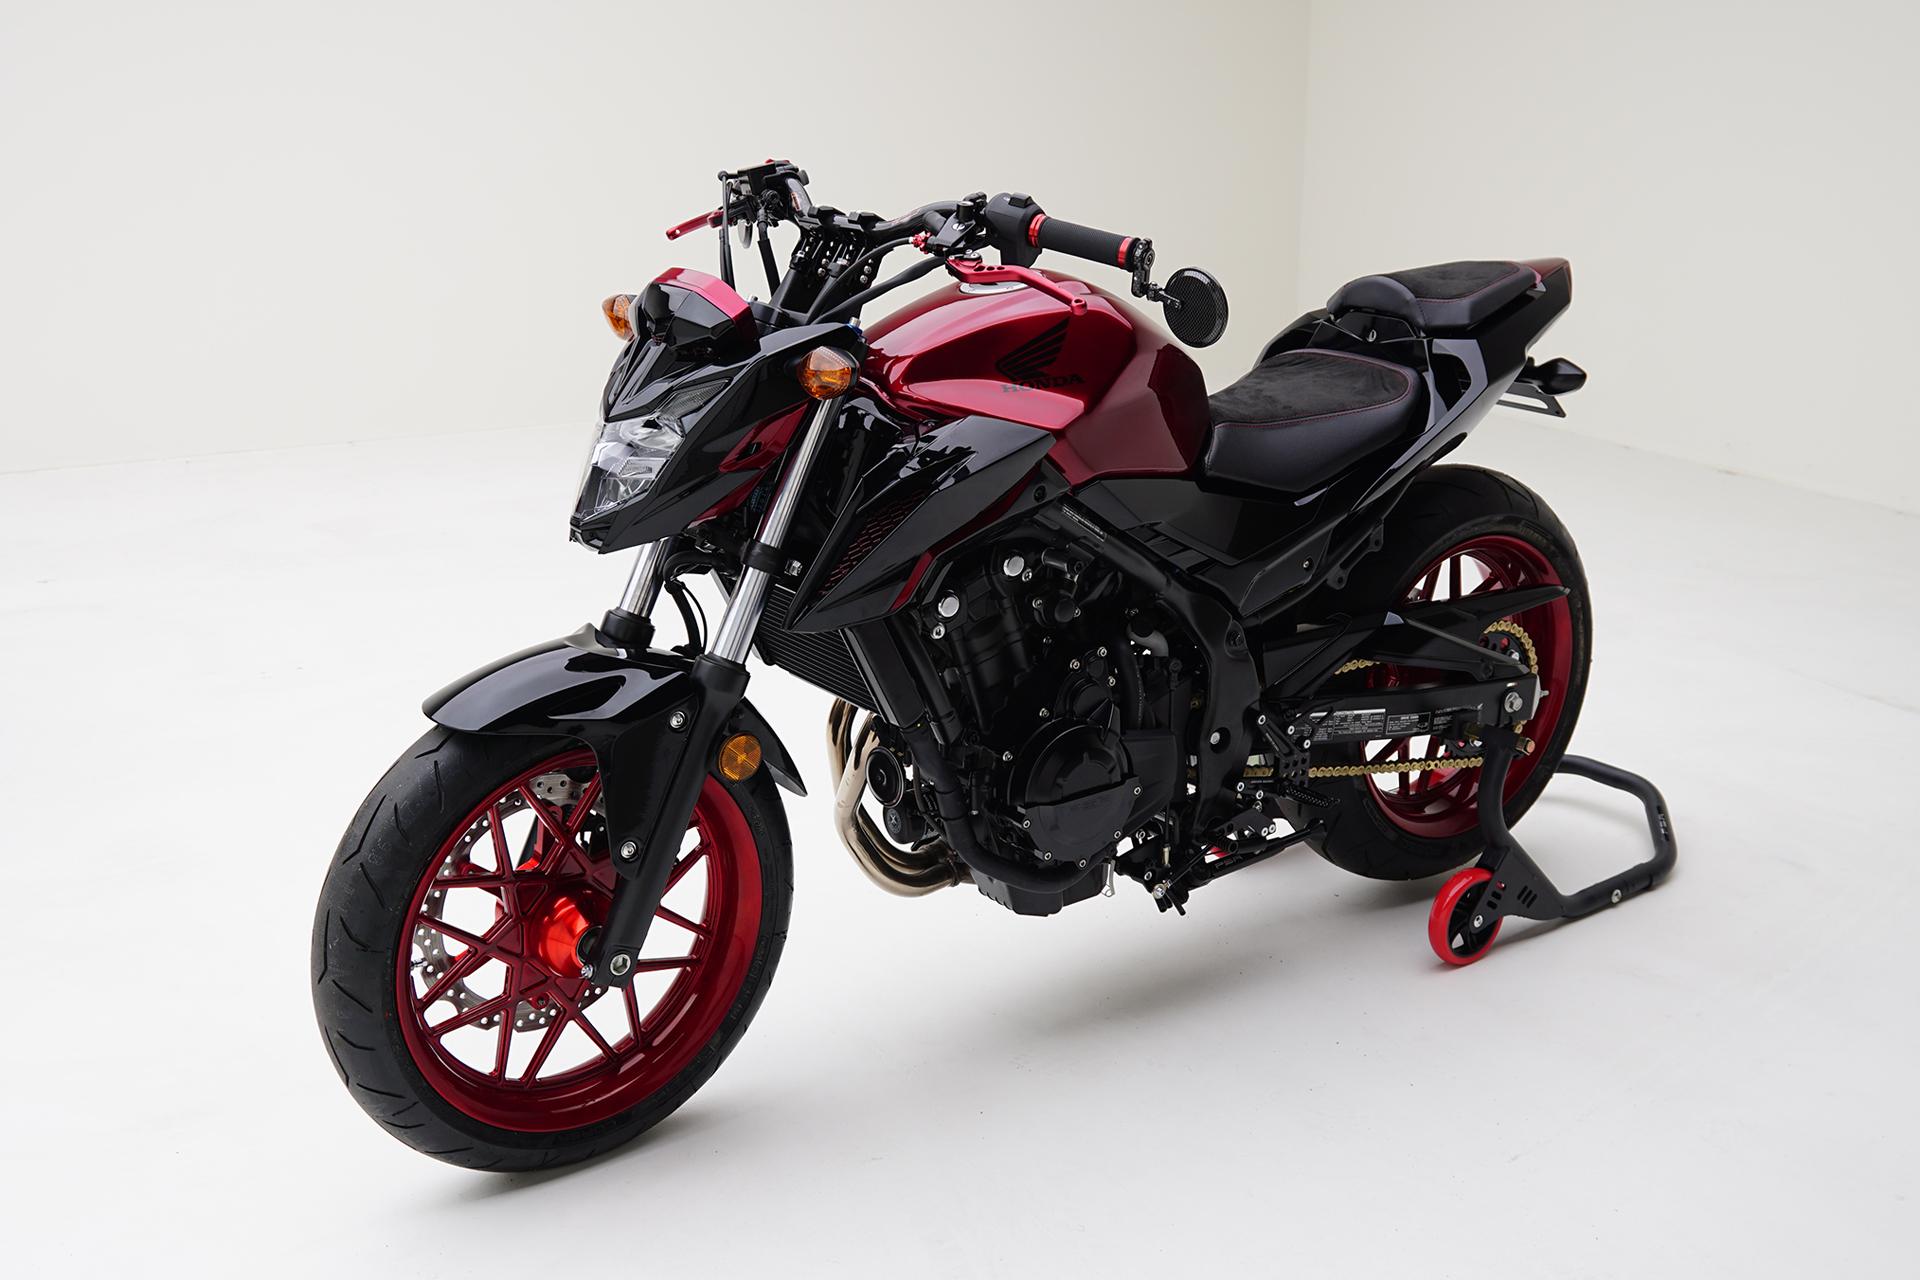 2016 MAD Honda CB500F Nake Sport Bike - MAD INDUSTRIES